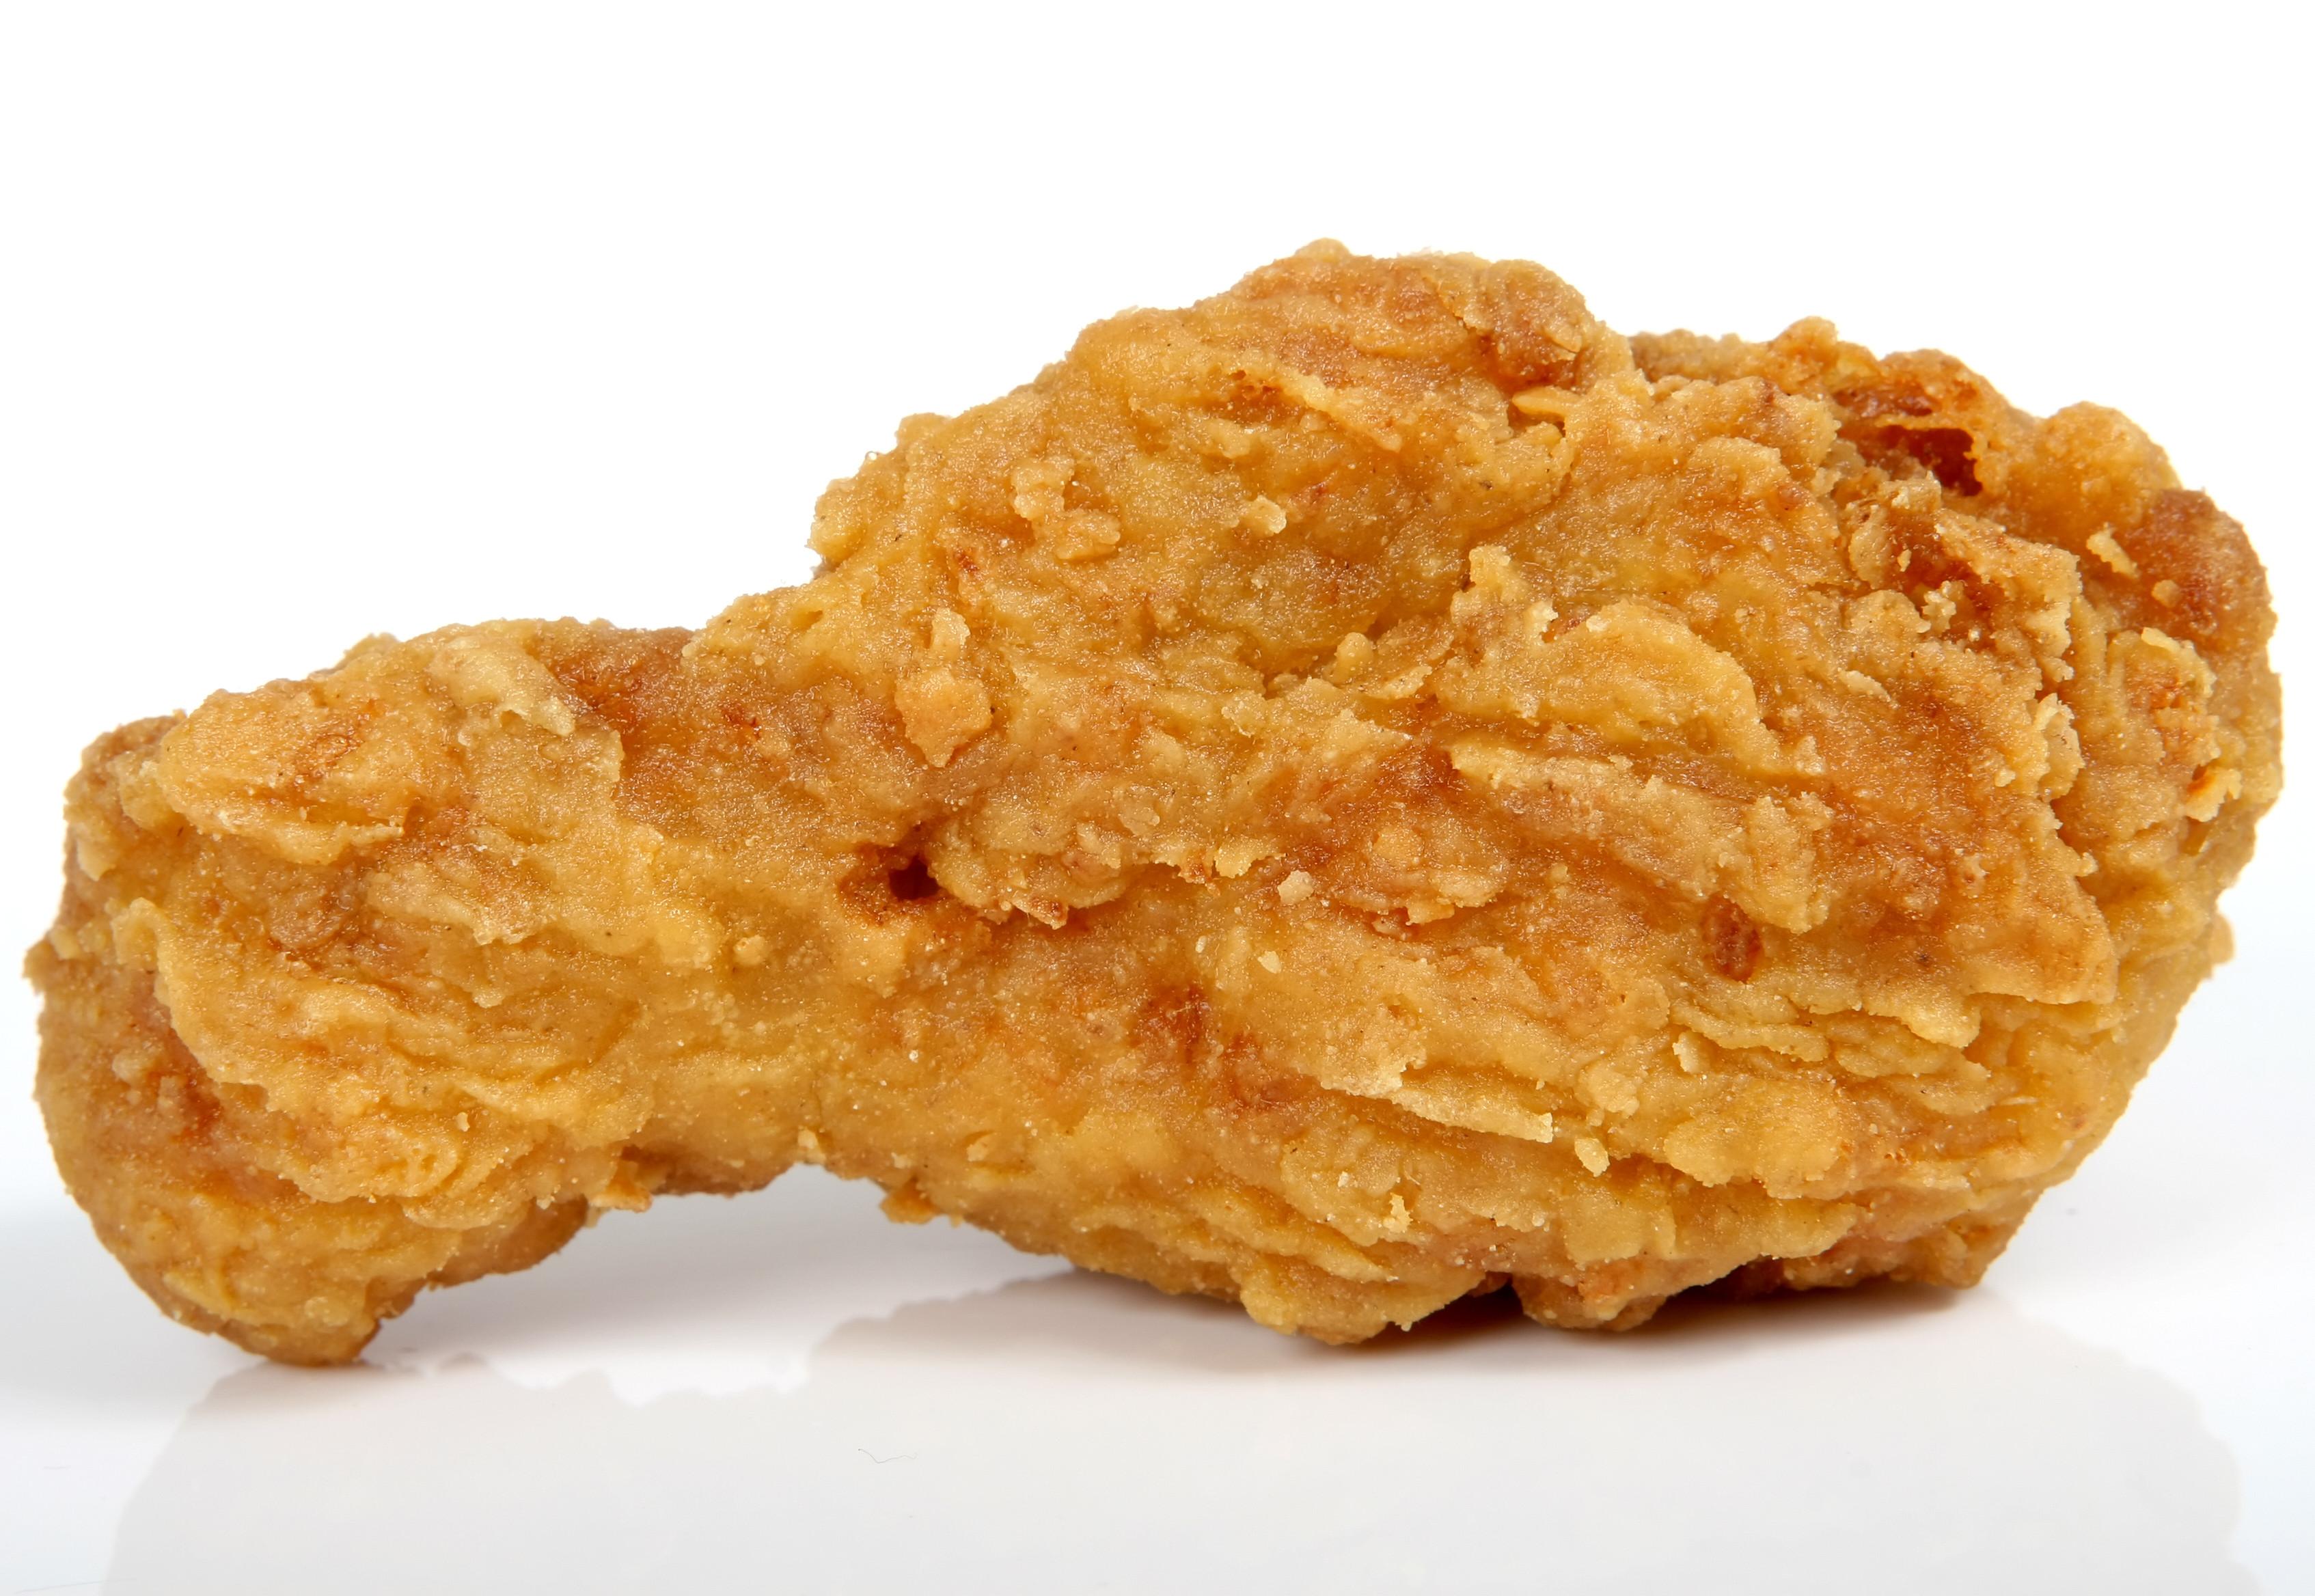 Fried Chicken Leg  Fried Chicken Leg